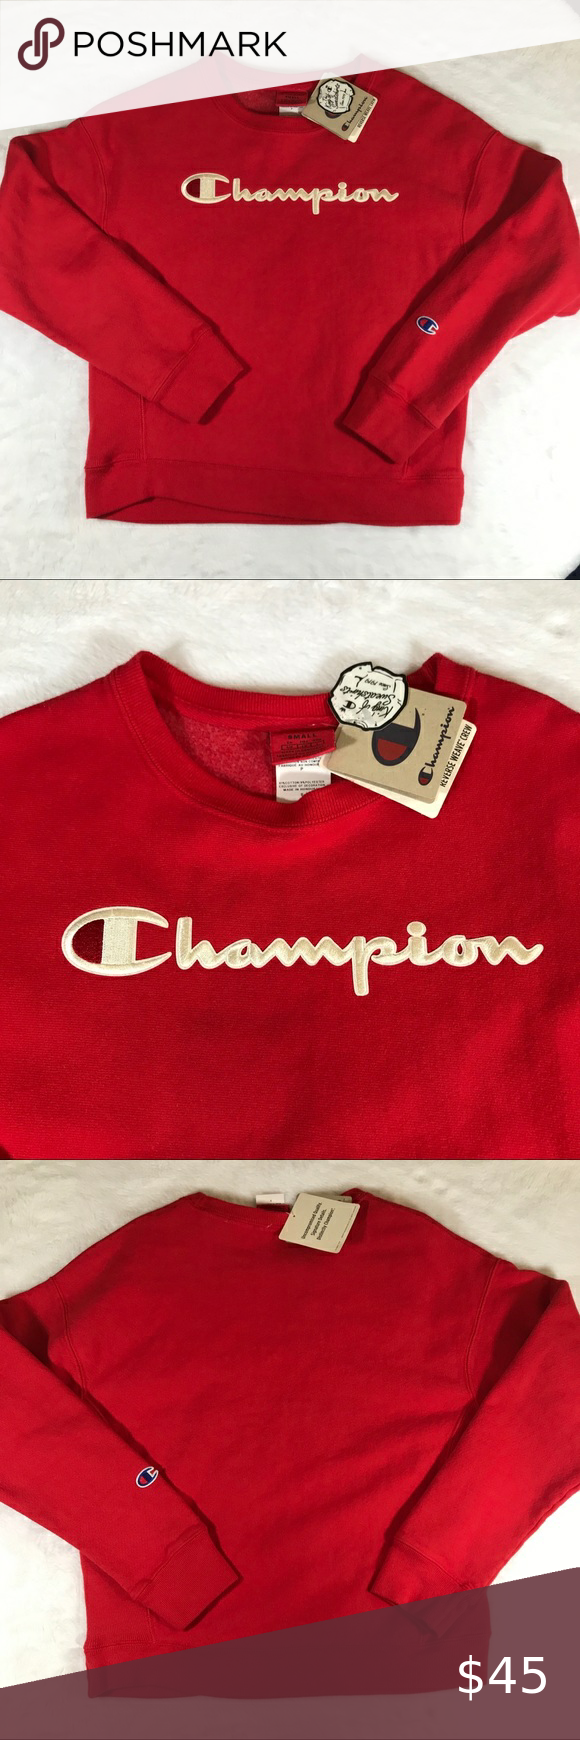 Nwt Champion Red Sweatshirt Reverse Weave Script S Red Sweatshirts Sweatshirts Sweater Hoodie [ 1740 x 580 Pixel ]